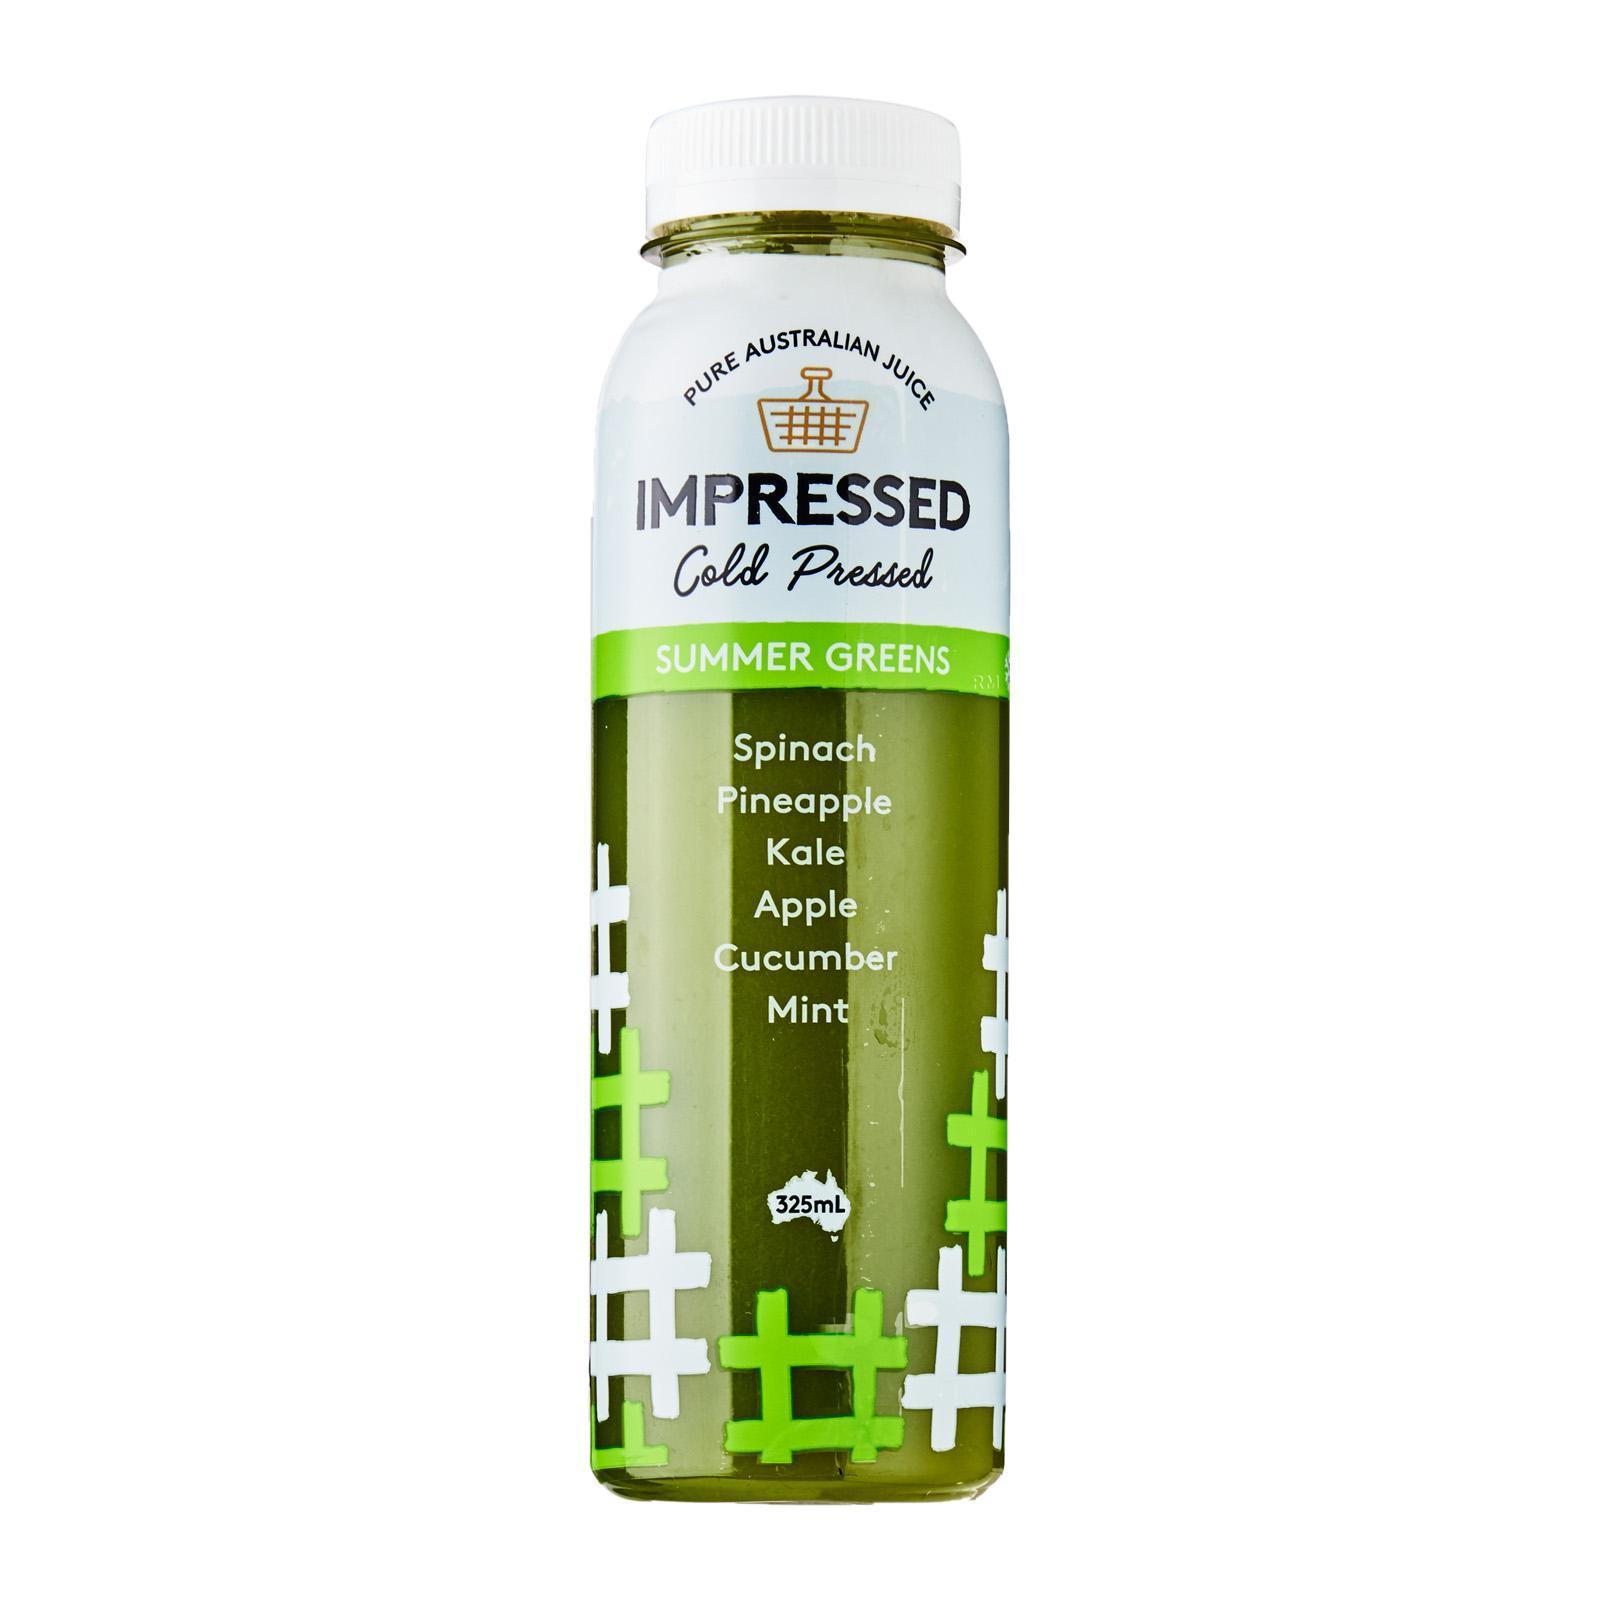 Impressed Summer Greens Cold Pressed Juice